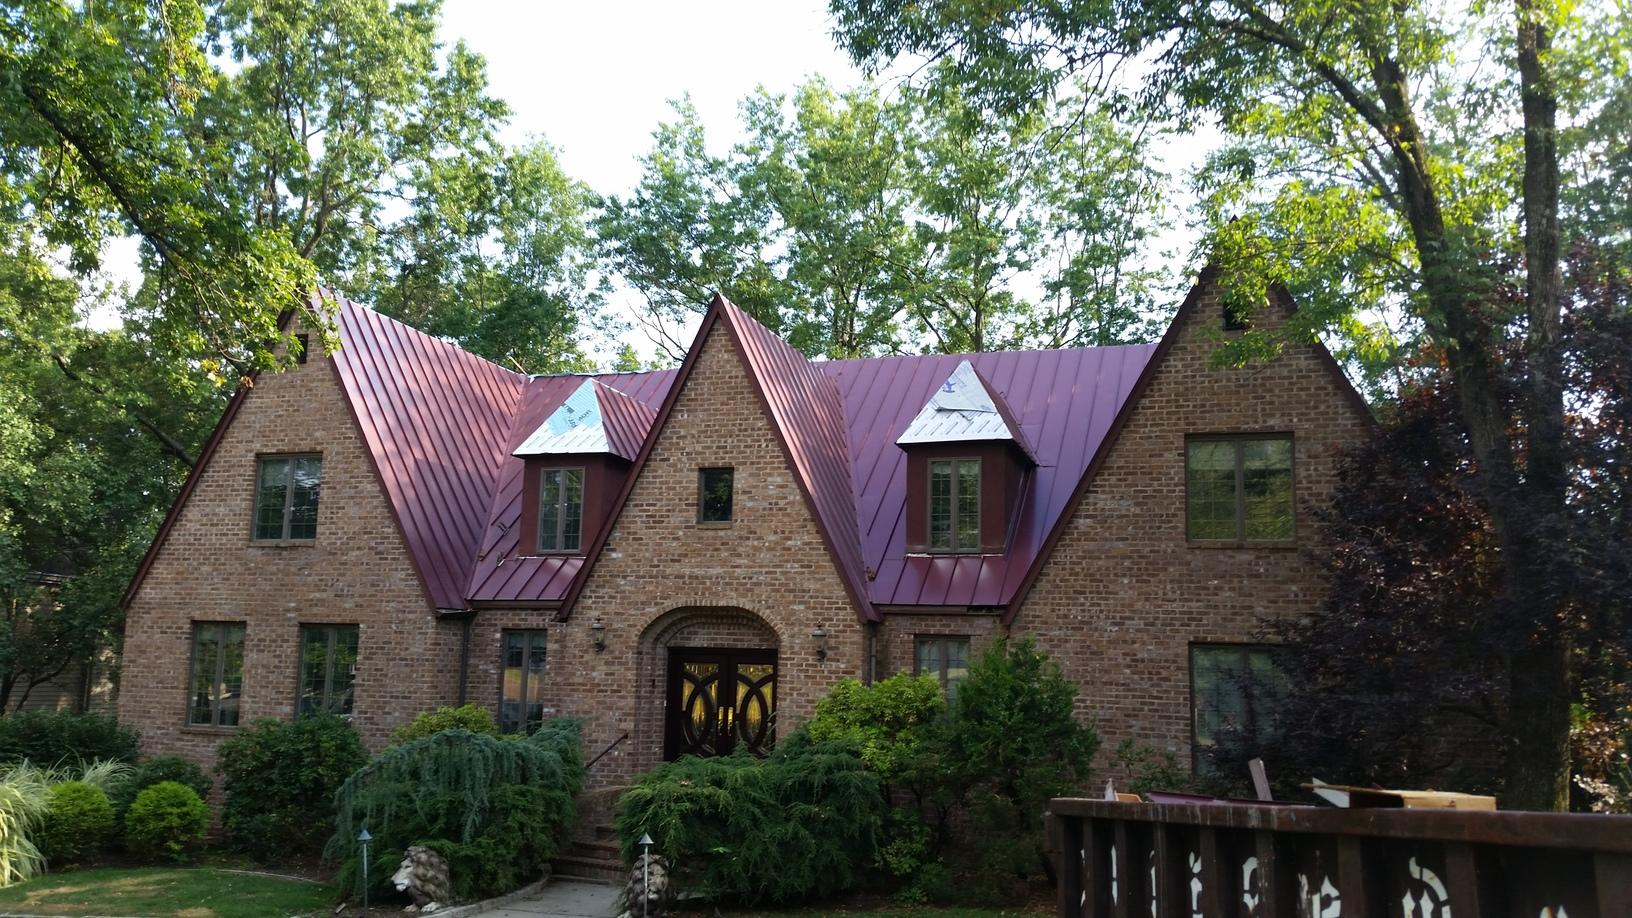 Burgundy Standing Seam Metal Roof Install in Piscataway, NJ